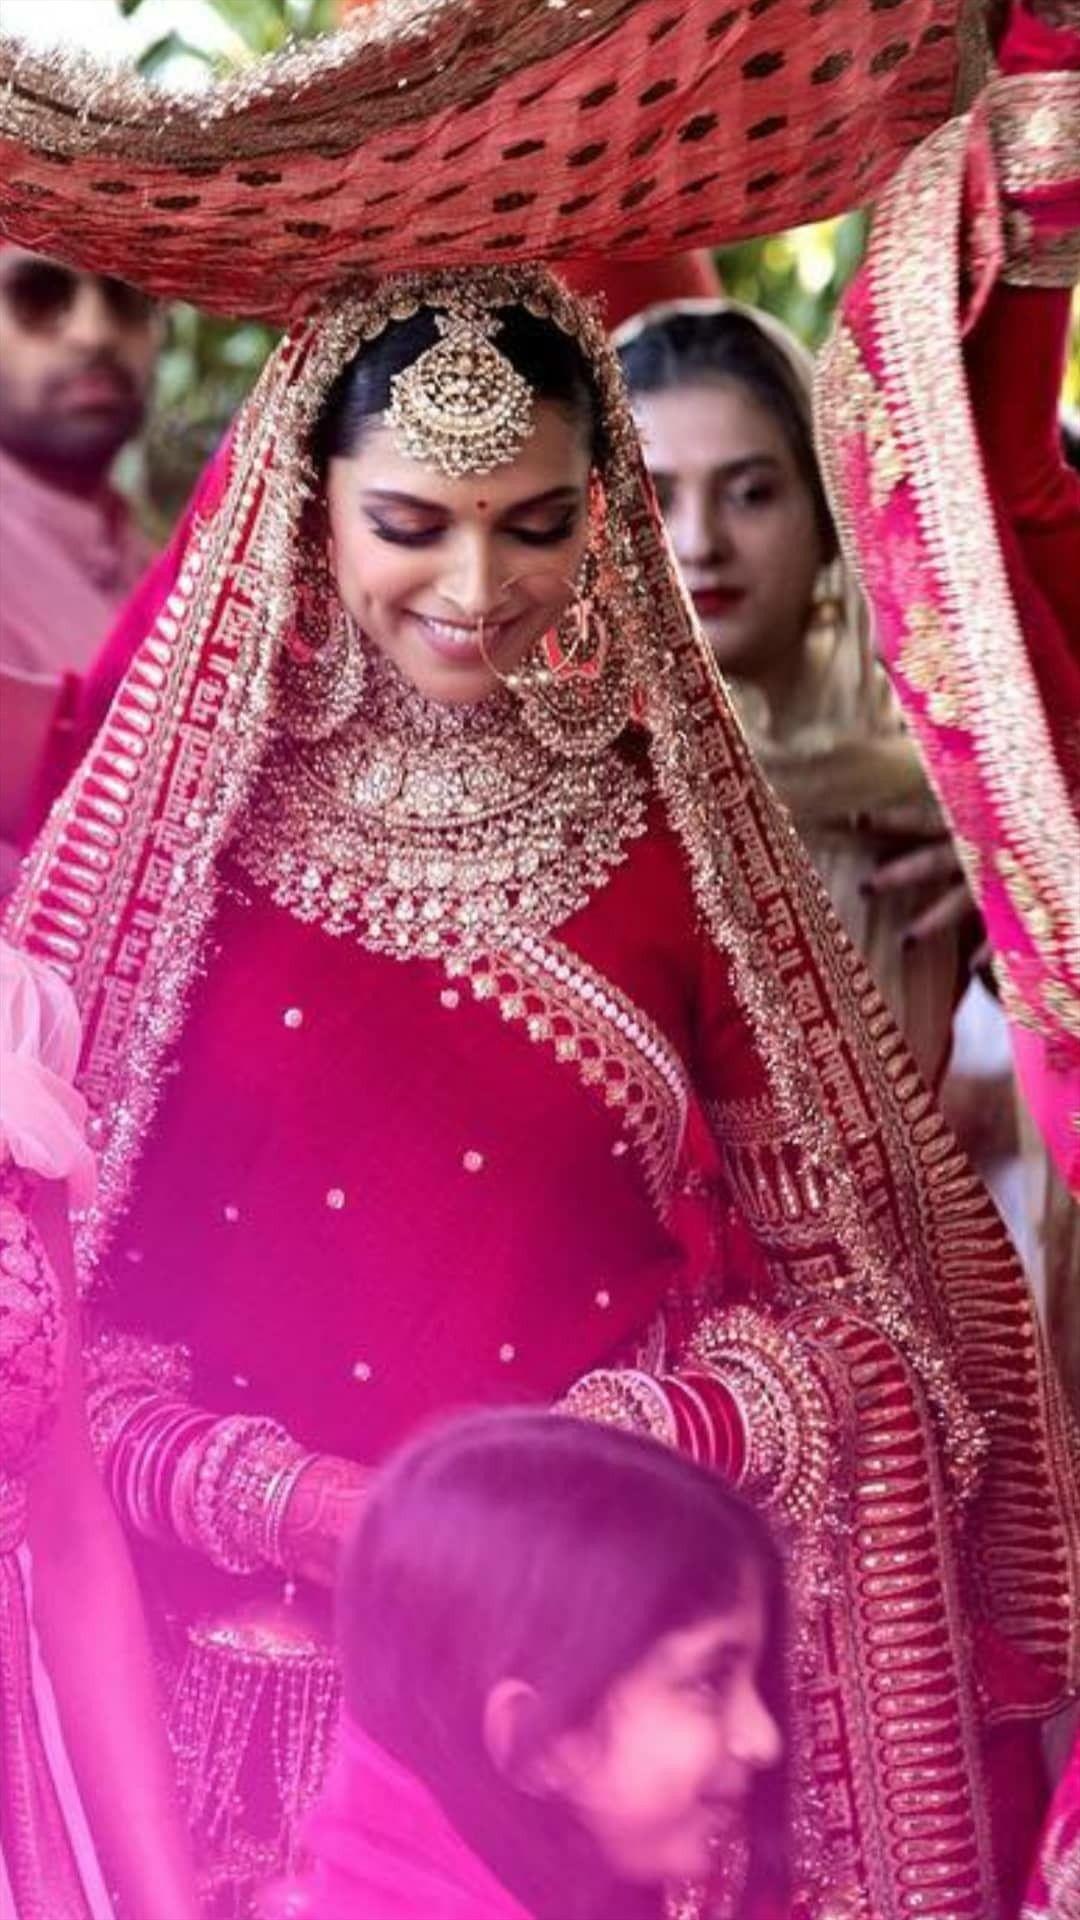 Wedding Ptgy Sabyasachi Lehenga Bridal Sabyasachi Bridal Indian Bridal Dress